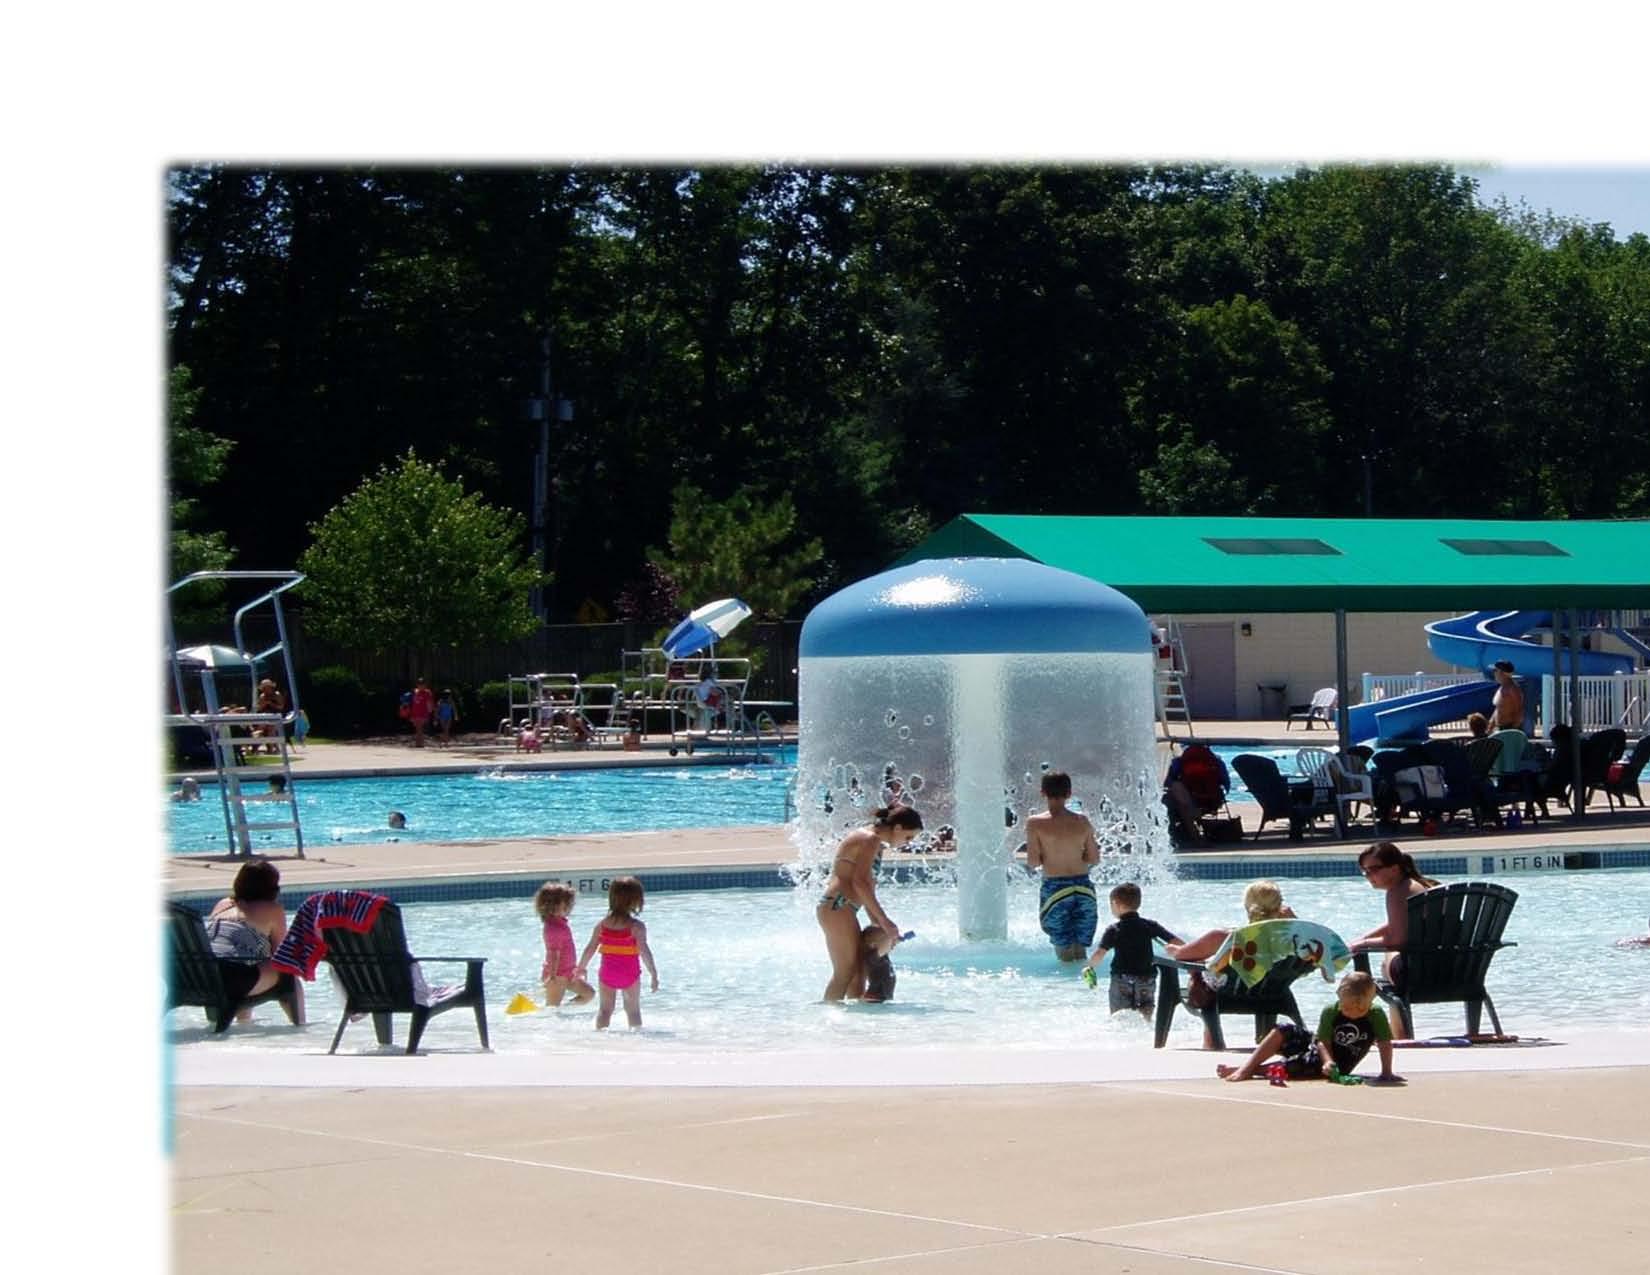 Millburn township nj official website - White oak swimming pool opening times ...